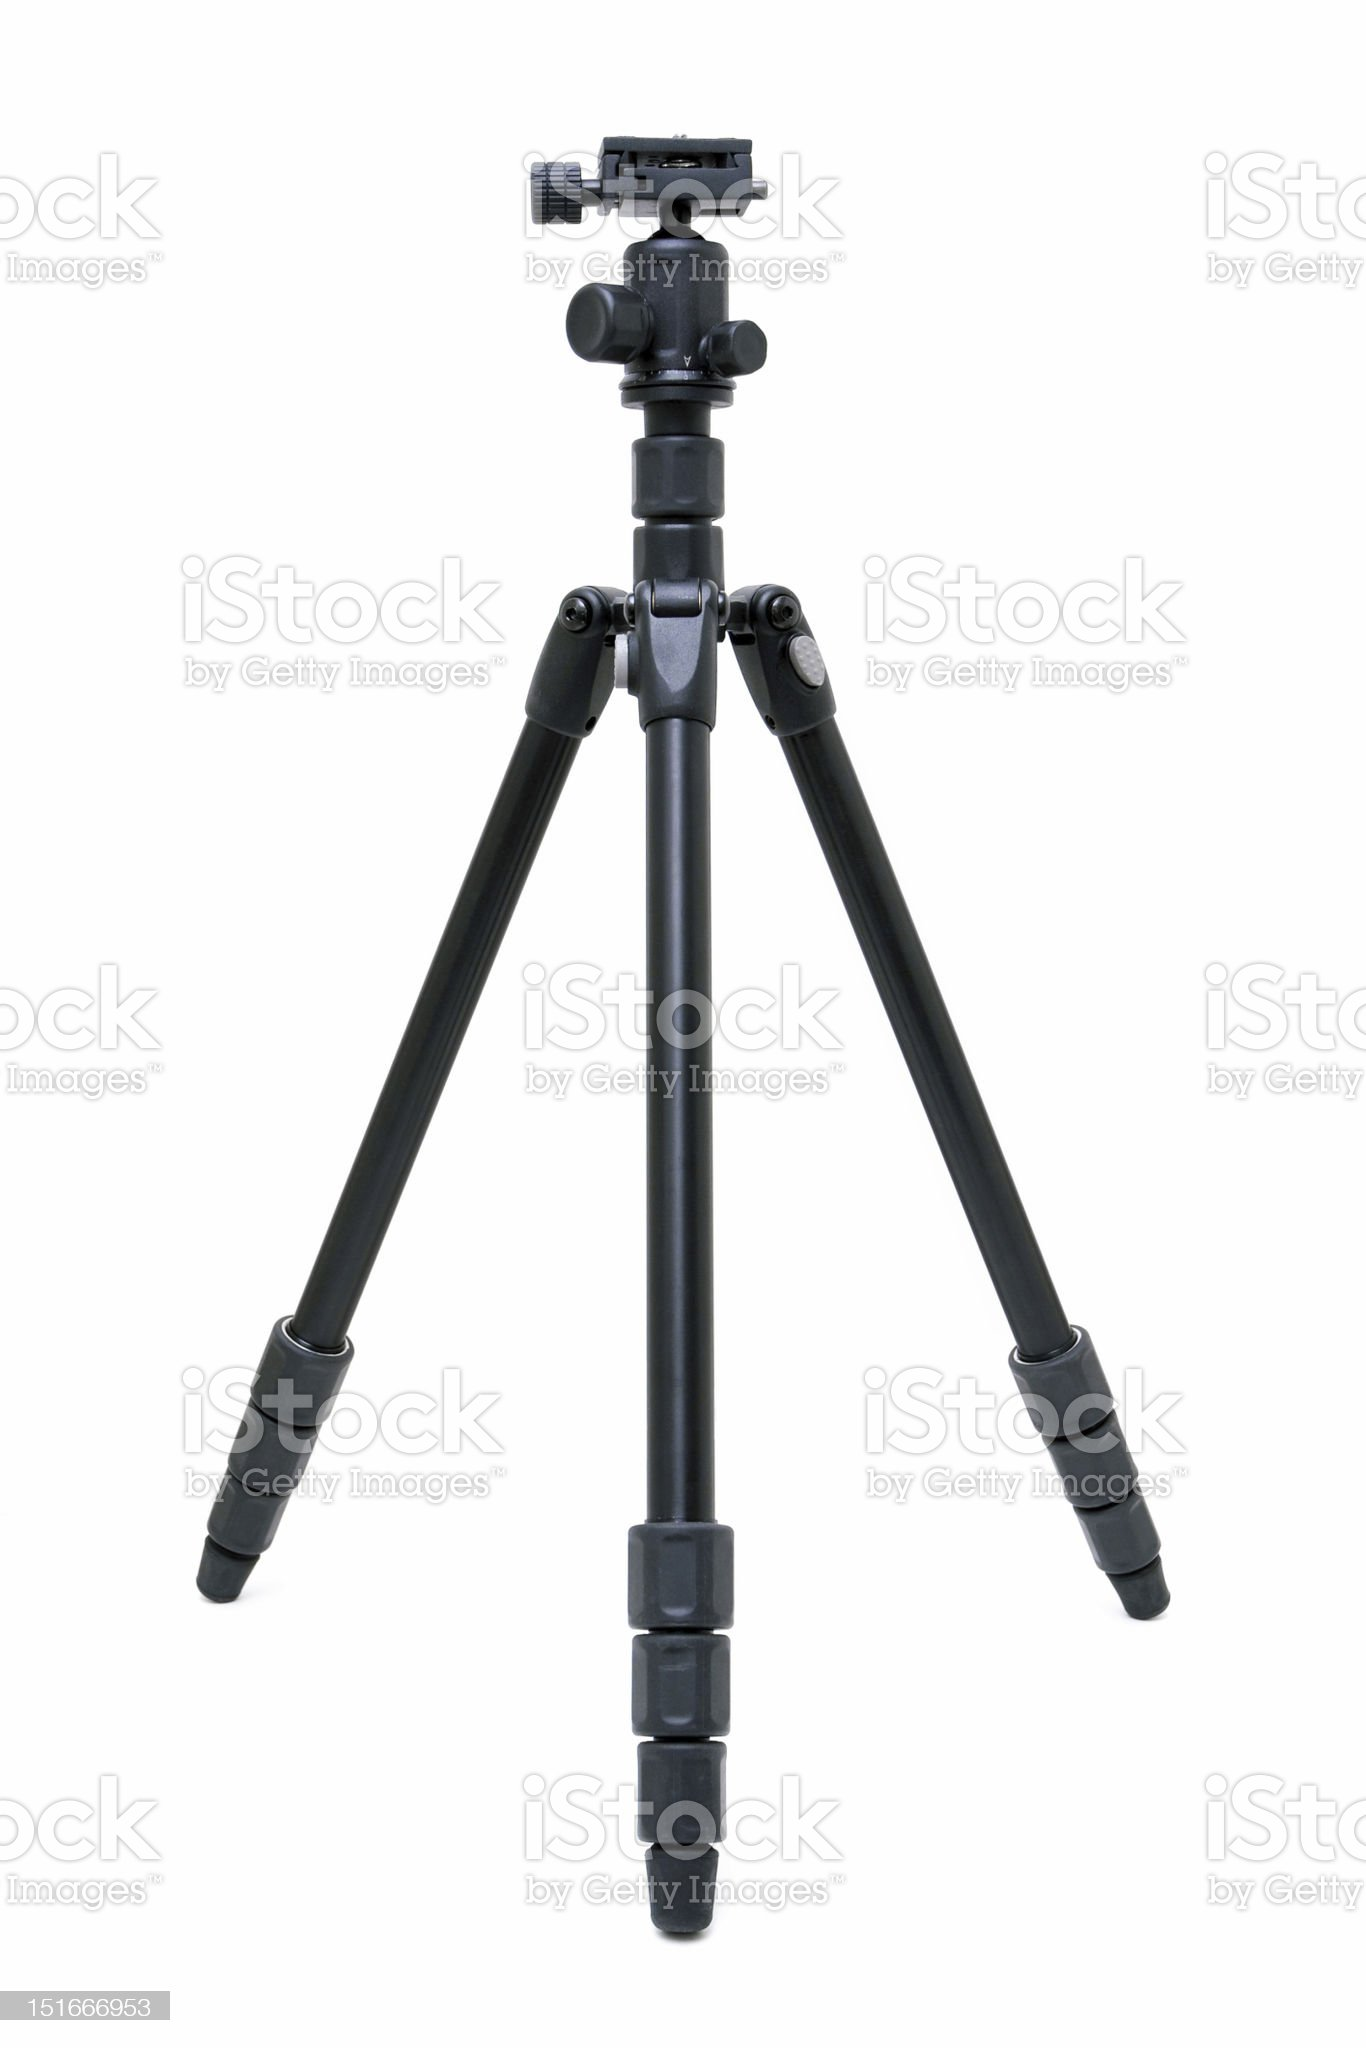 Camera tripod isolated on white background royalty-free stock photo